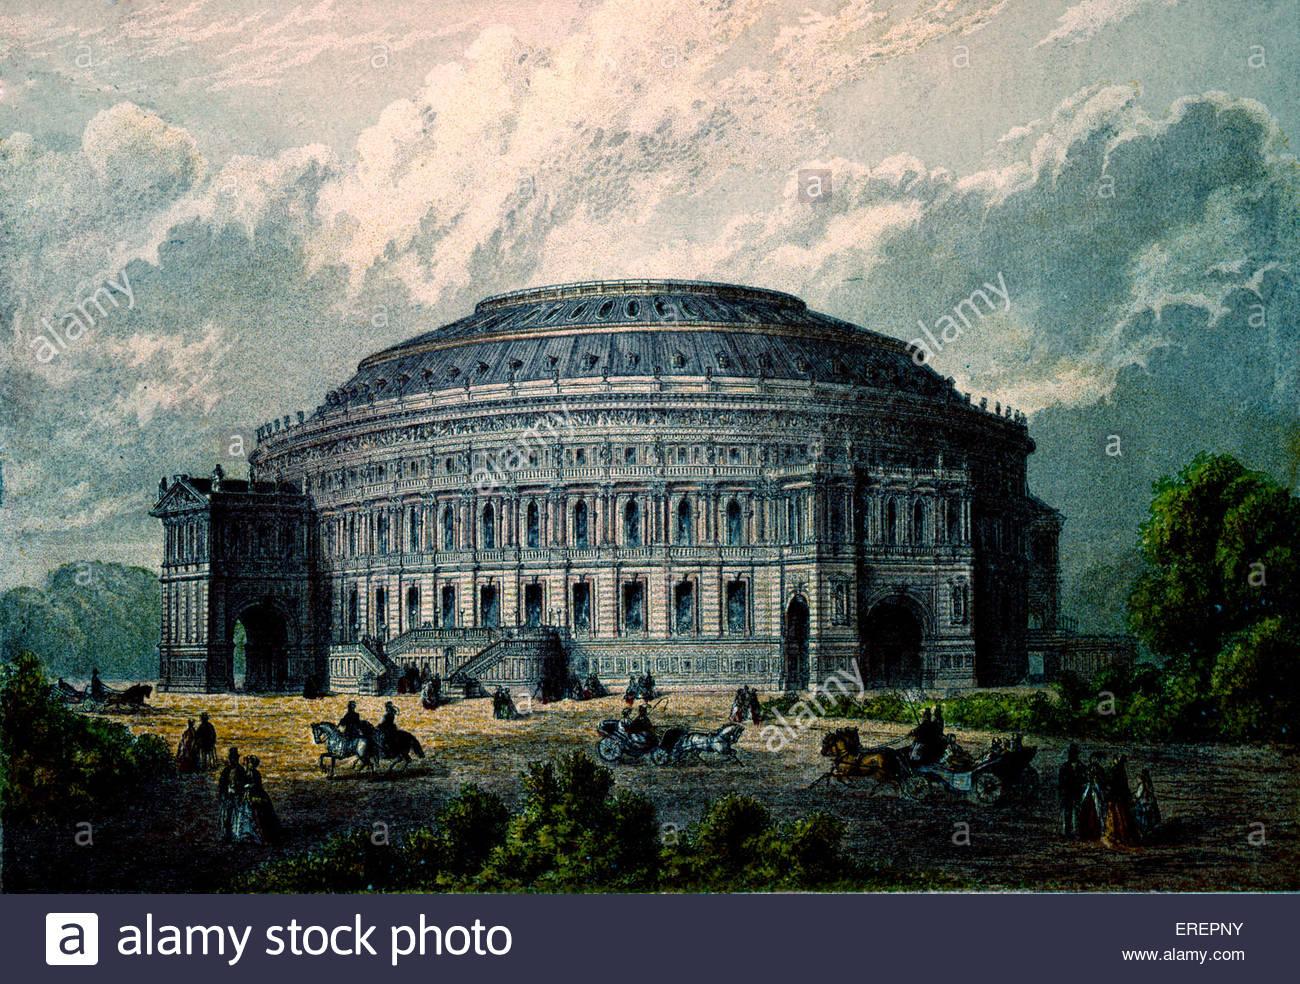 Royal Albert Hall - engraving, 2 November,1888. By Kronbeim & Co. London, UK. - Stock Image